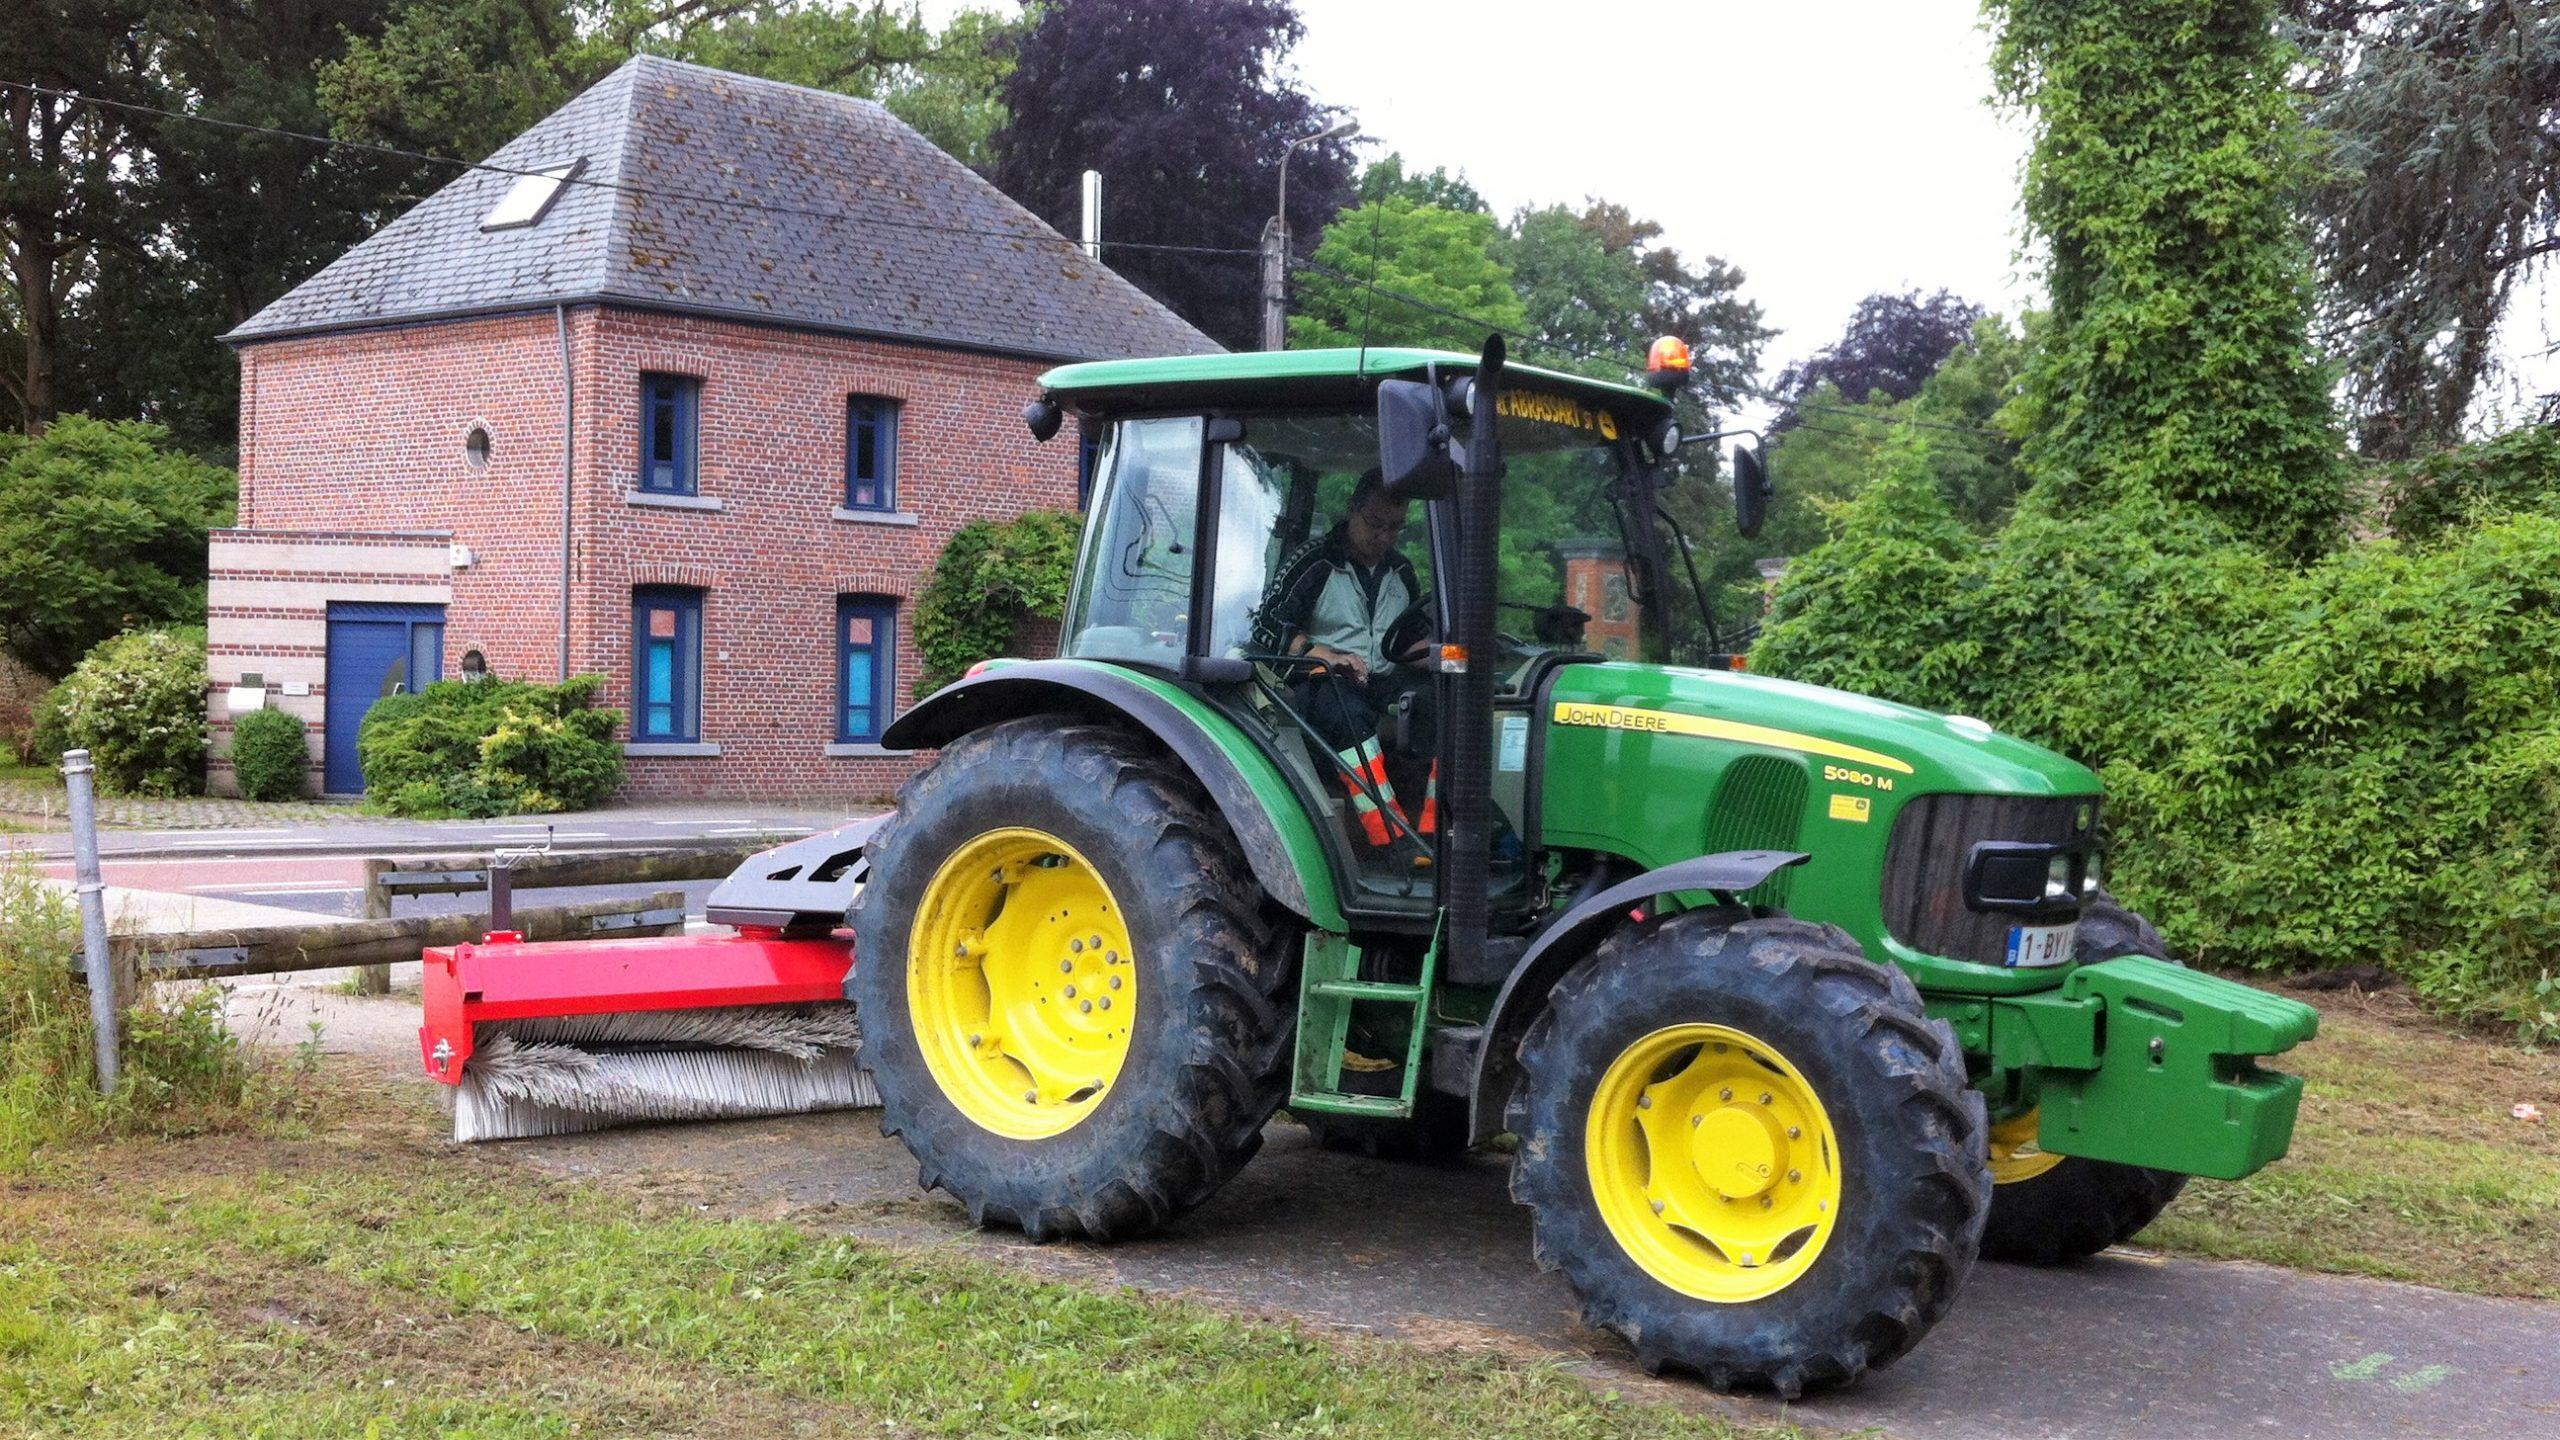 Tractor Mounted Sweeper on John Deere